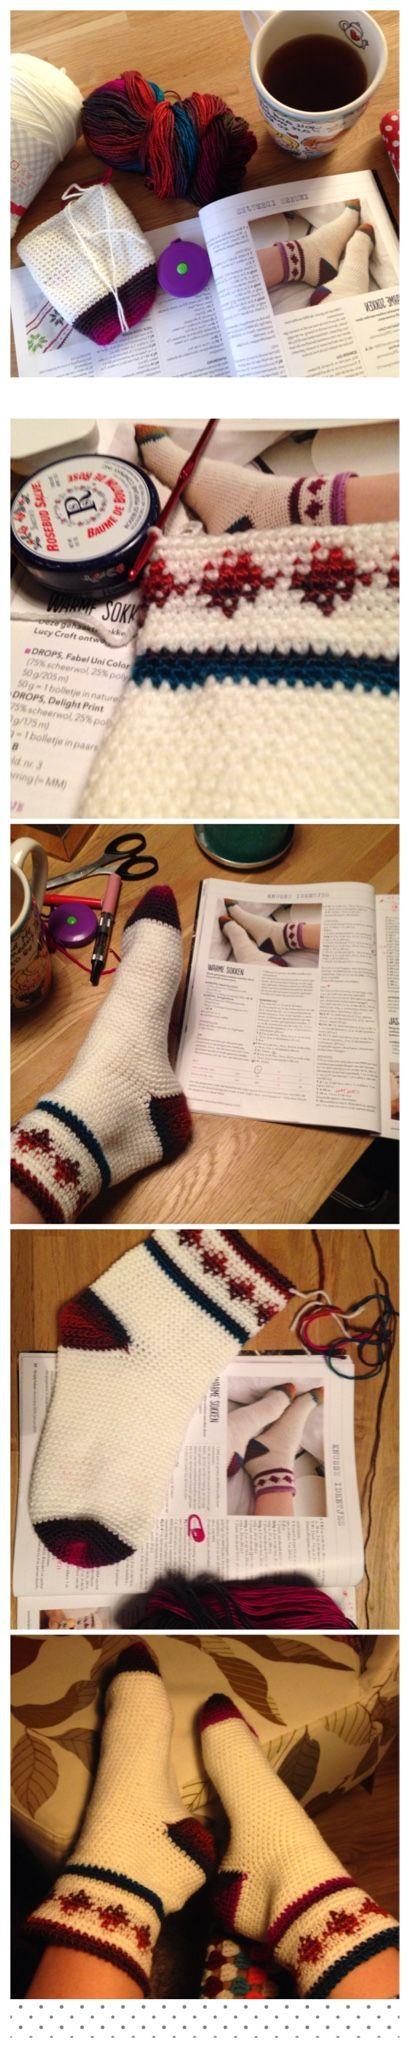 Uit simply crochet december.